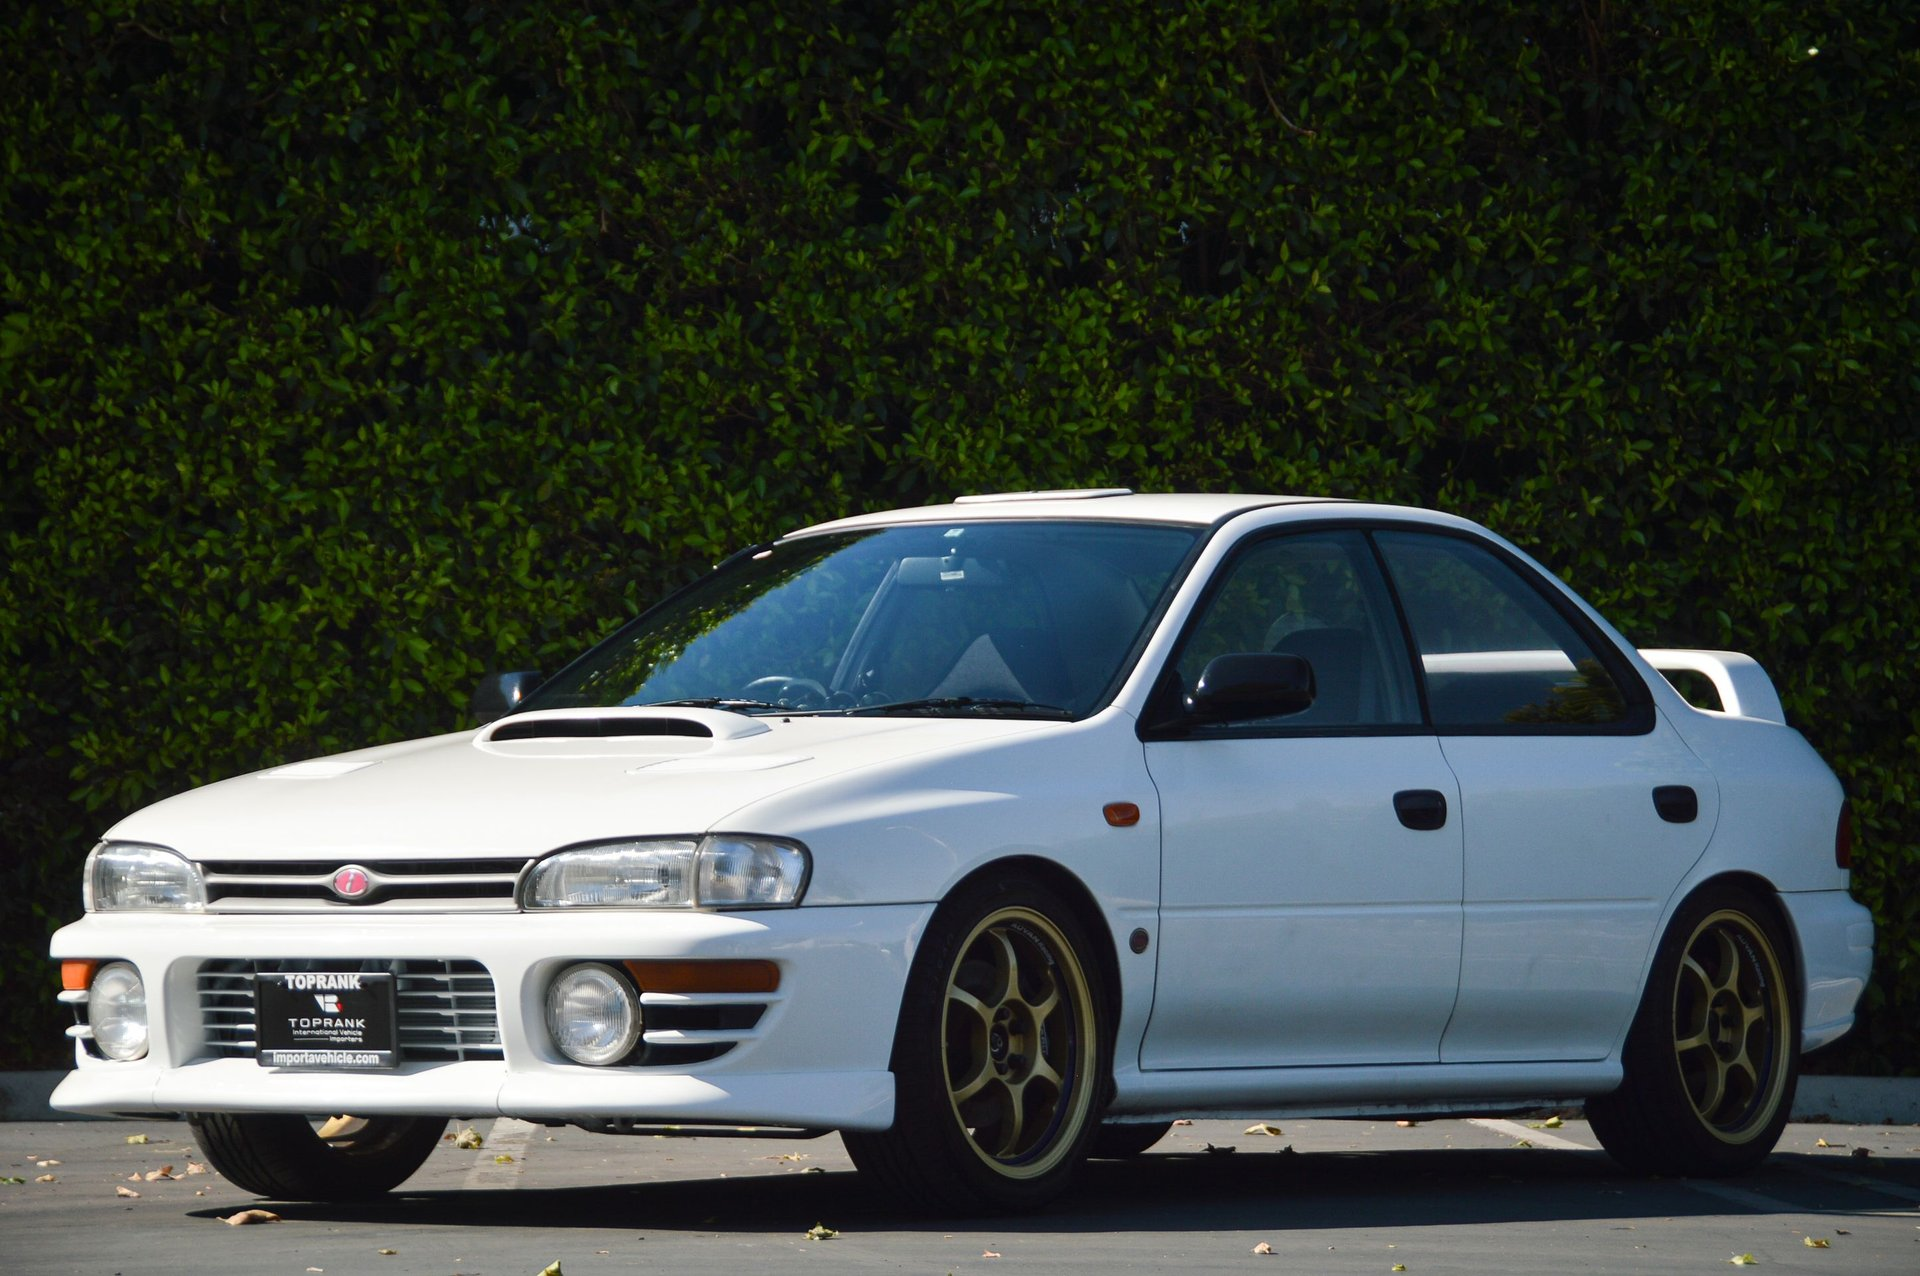 1996 Subaru Impreza WRX STI RA